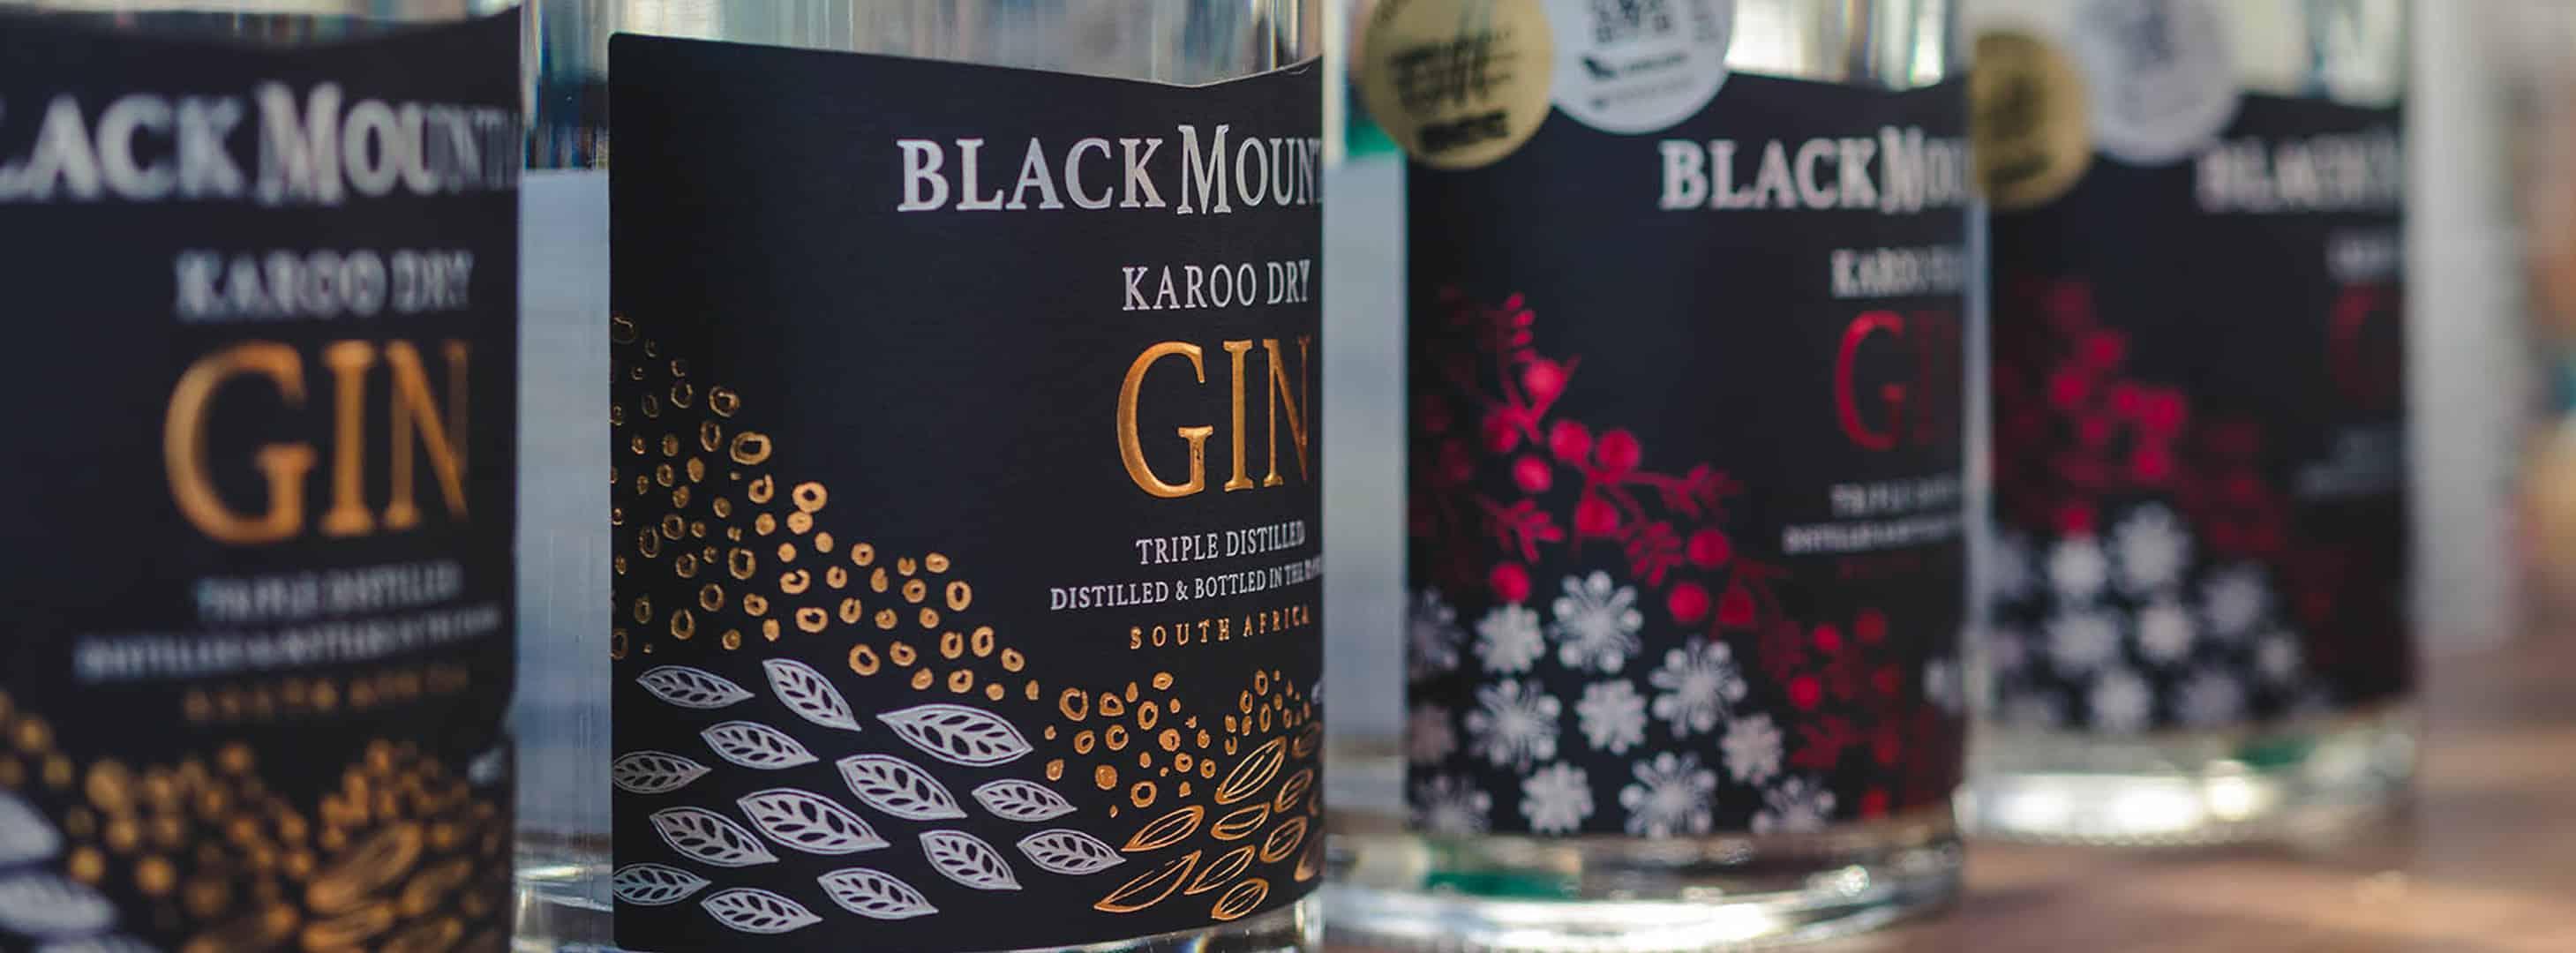 Black Mountain Gin